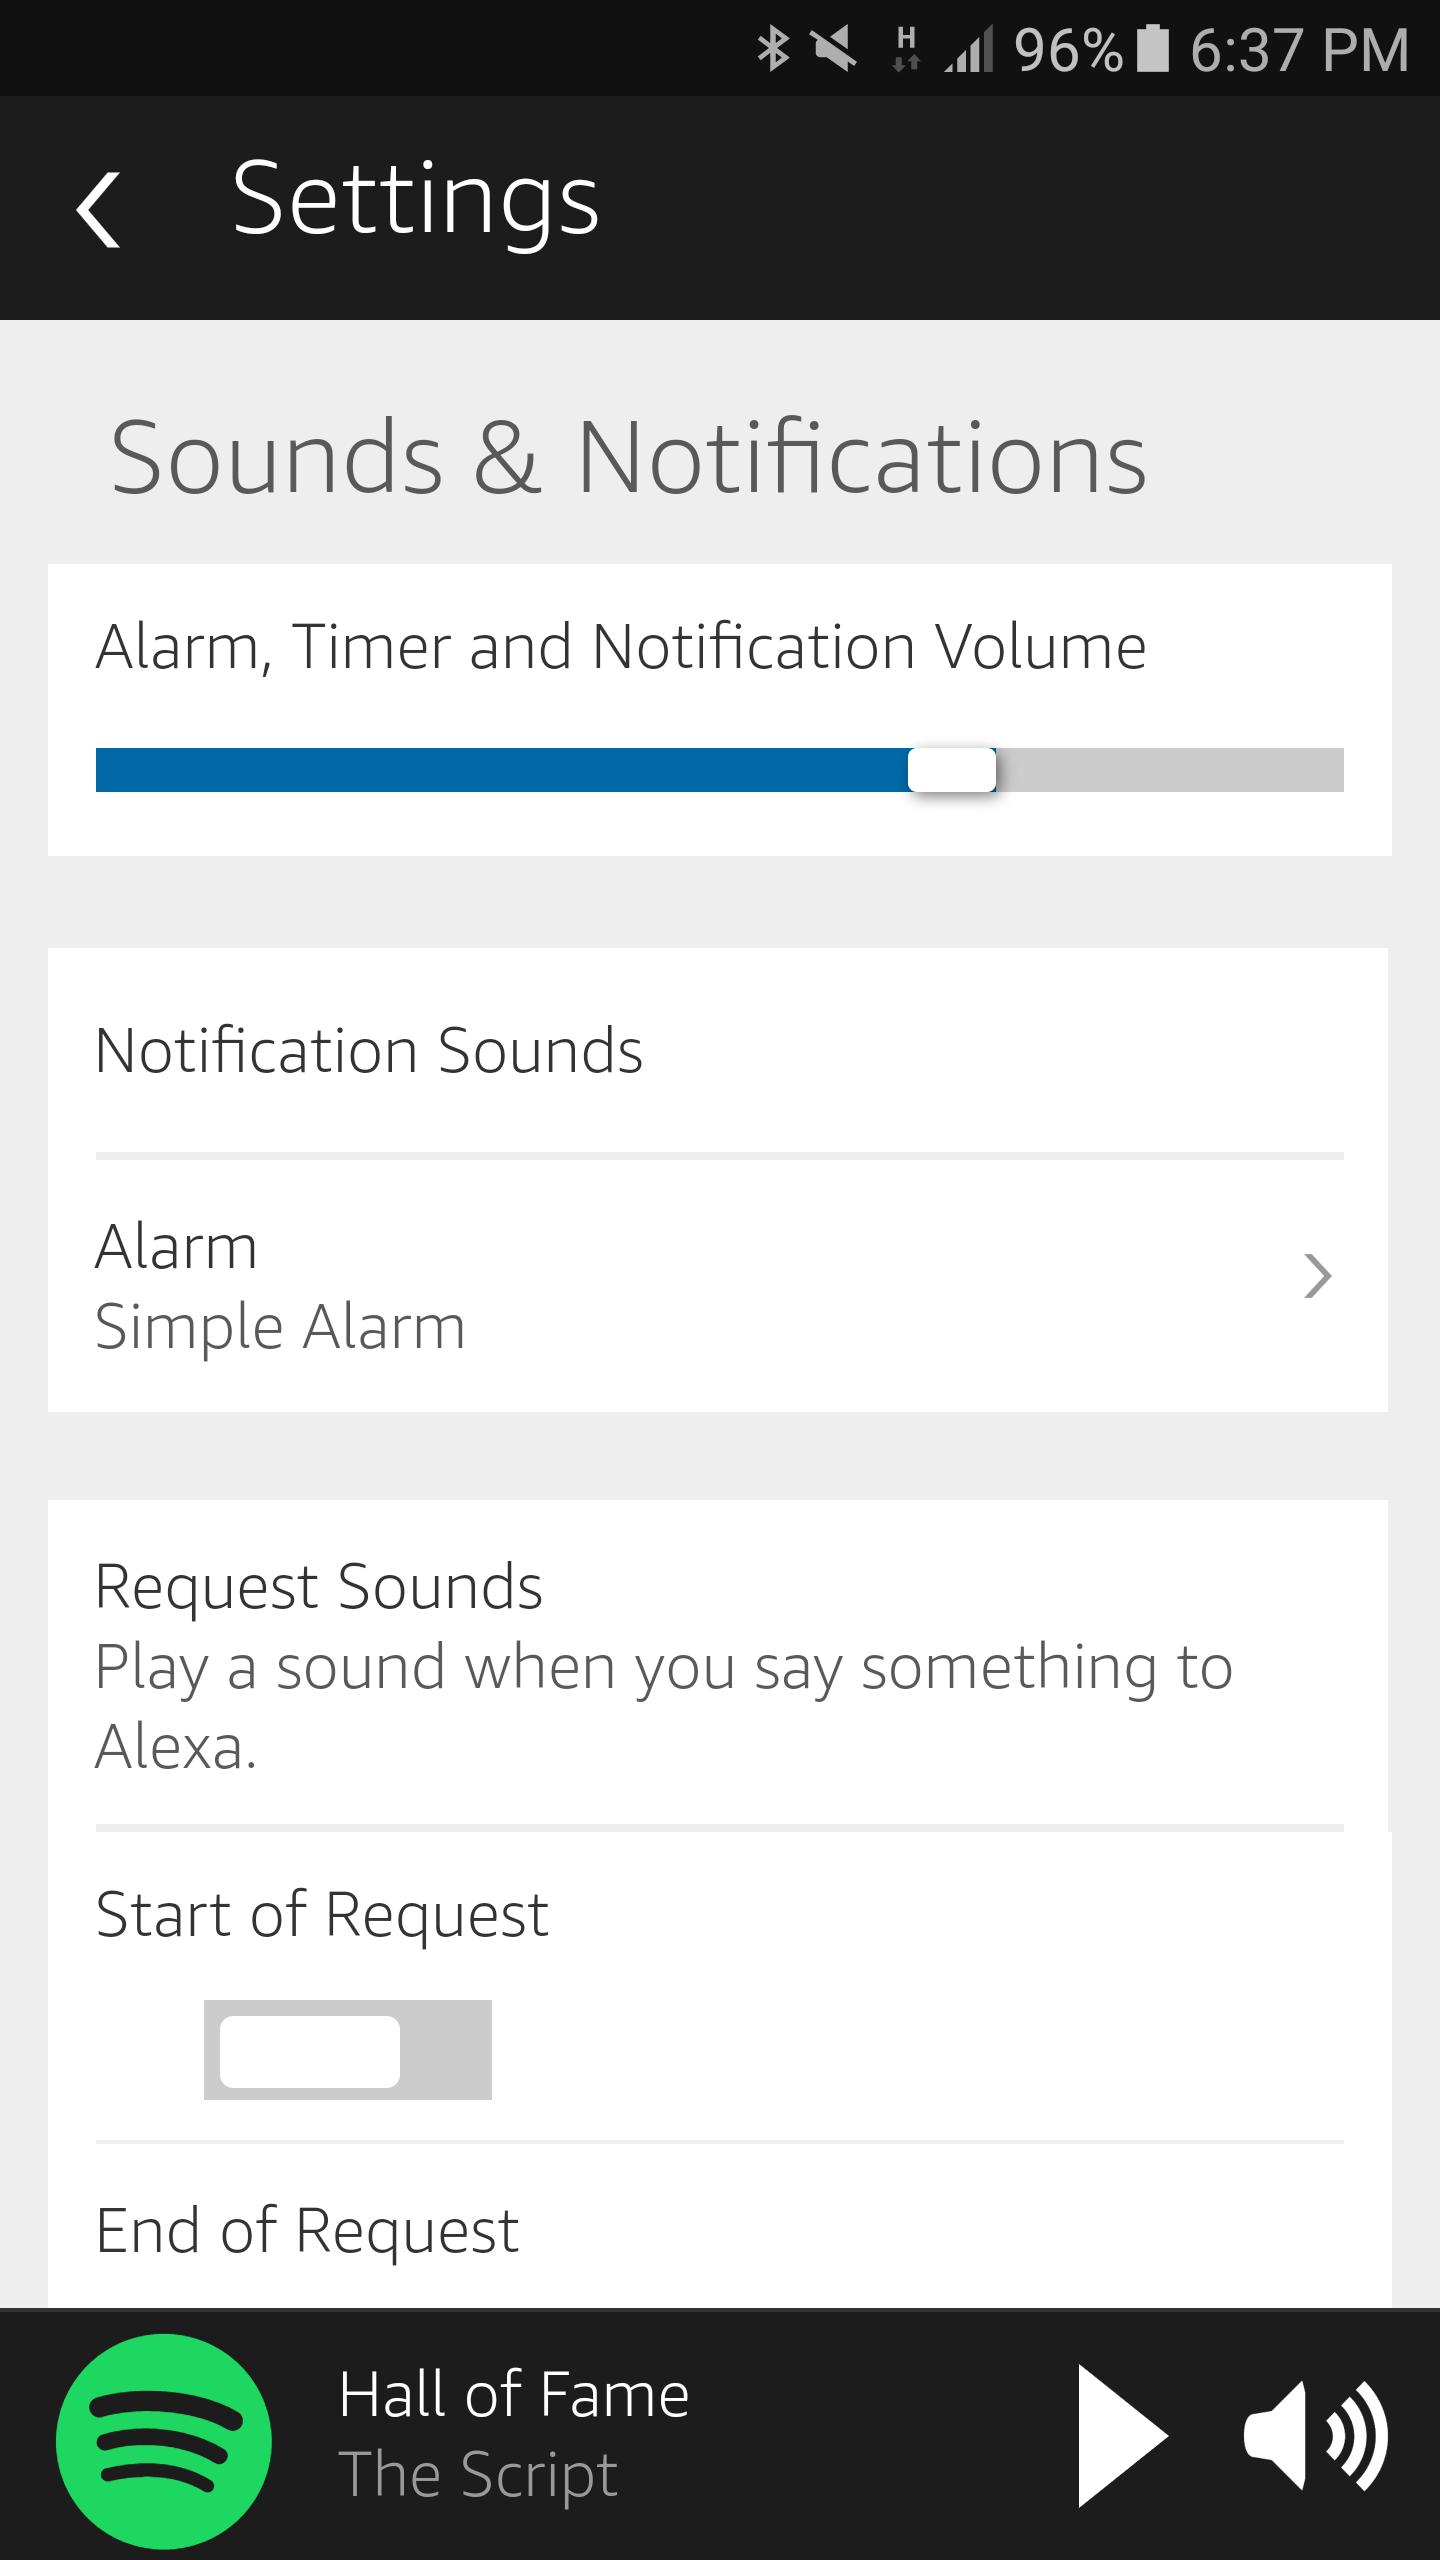 Bose Soundlink Back Amazon Echo Dot 2nd ge...